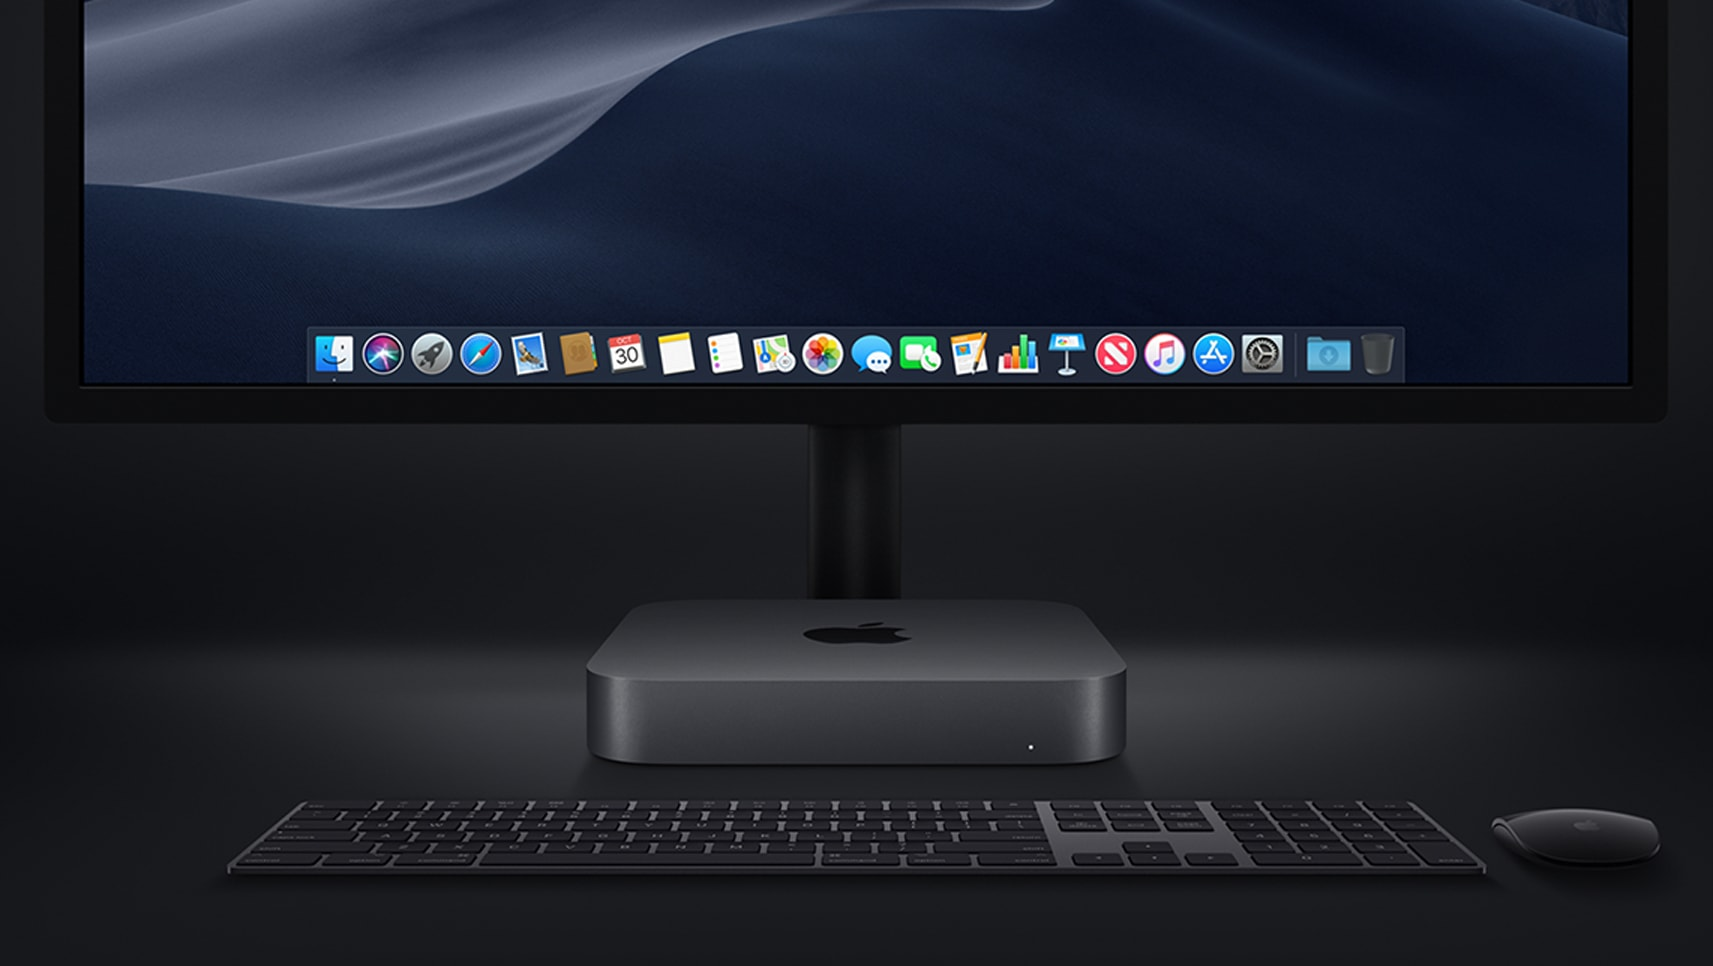 Mac mini cinza espacial com teclado, mouse e monitor pretos